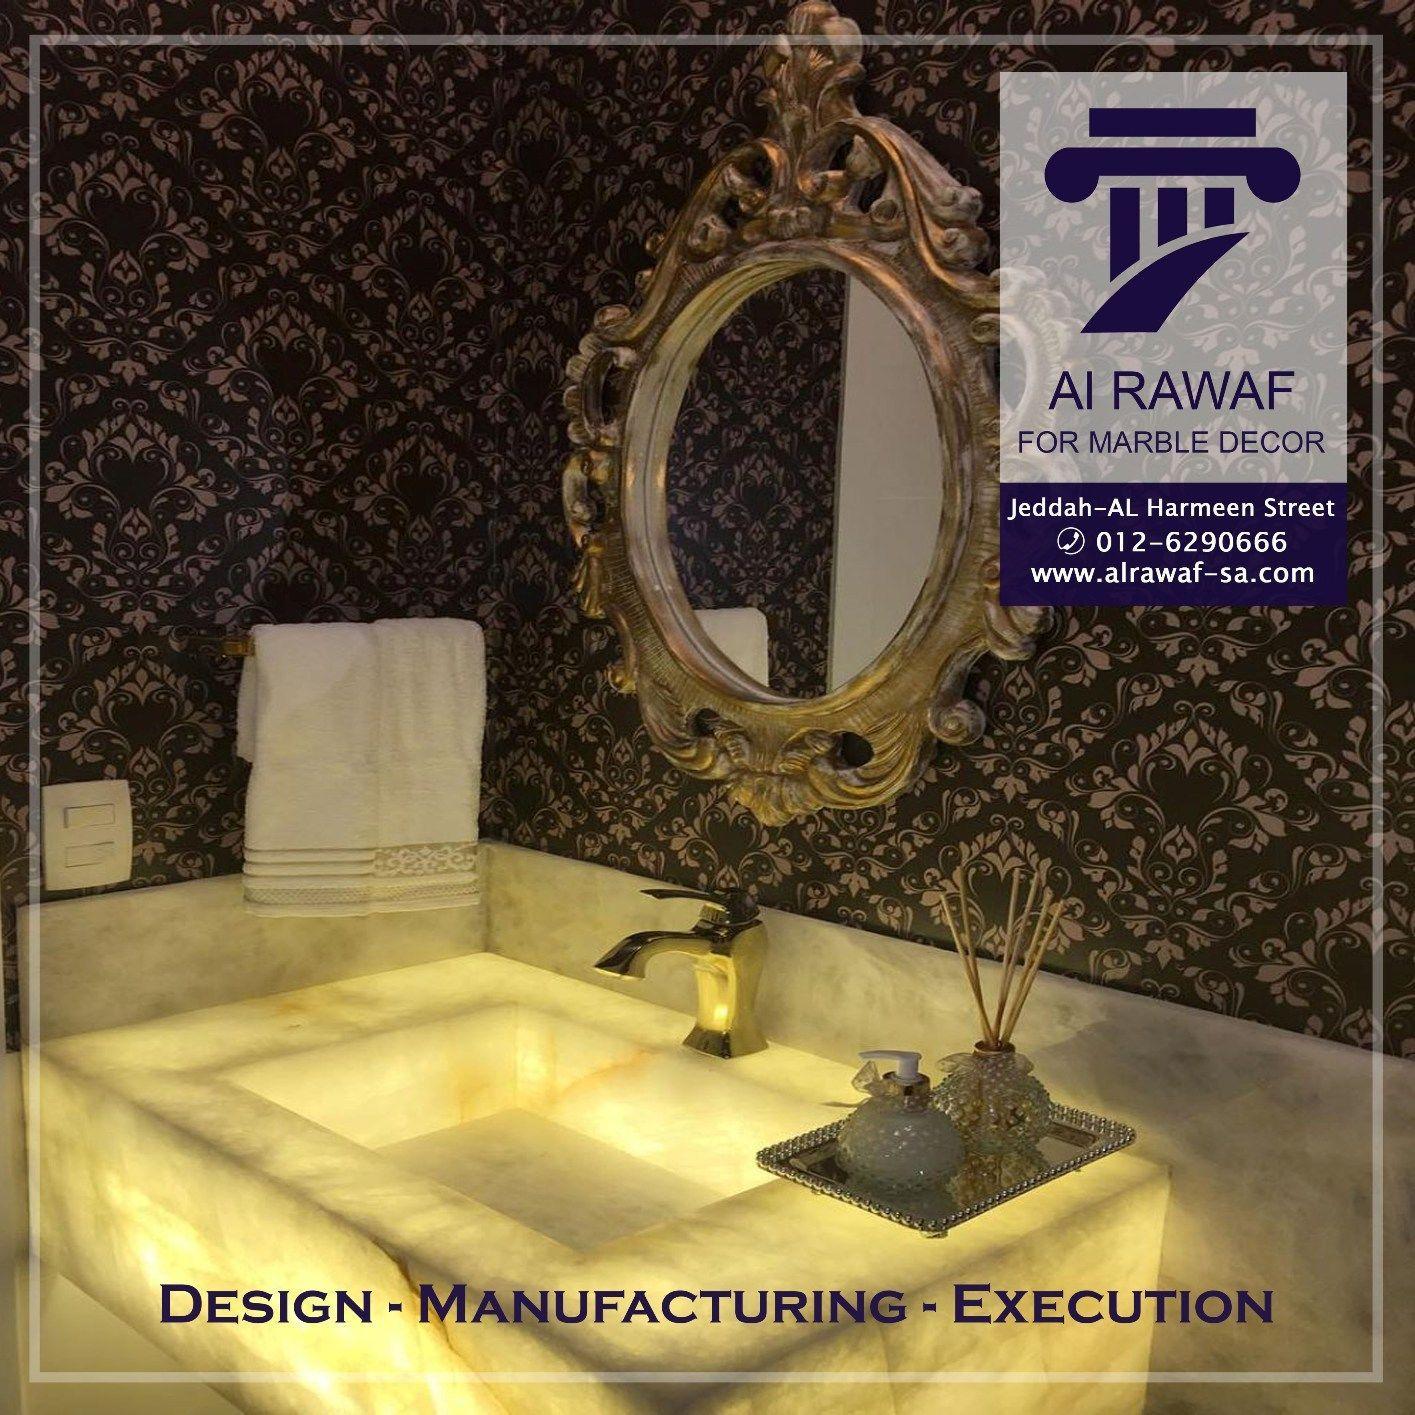 مغاسل رخام تصاميم مغاسل رخام الرواف لديكورات الرخام Marble Decor Decor Marble